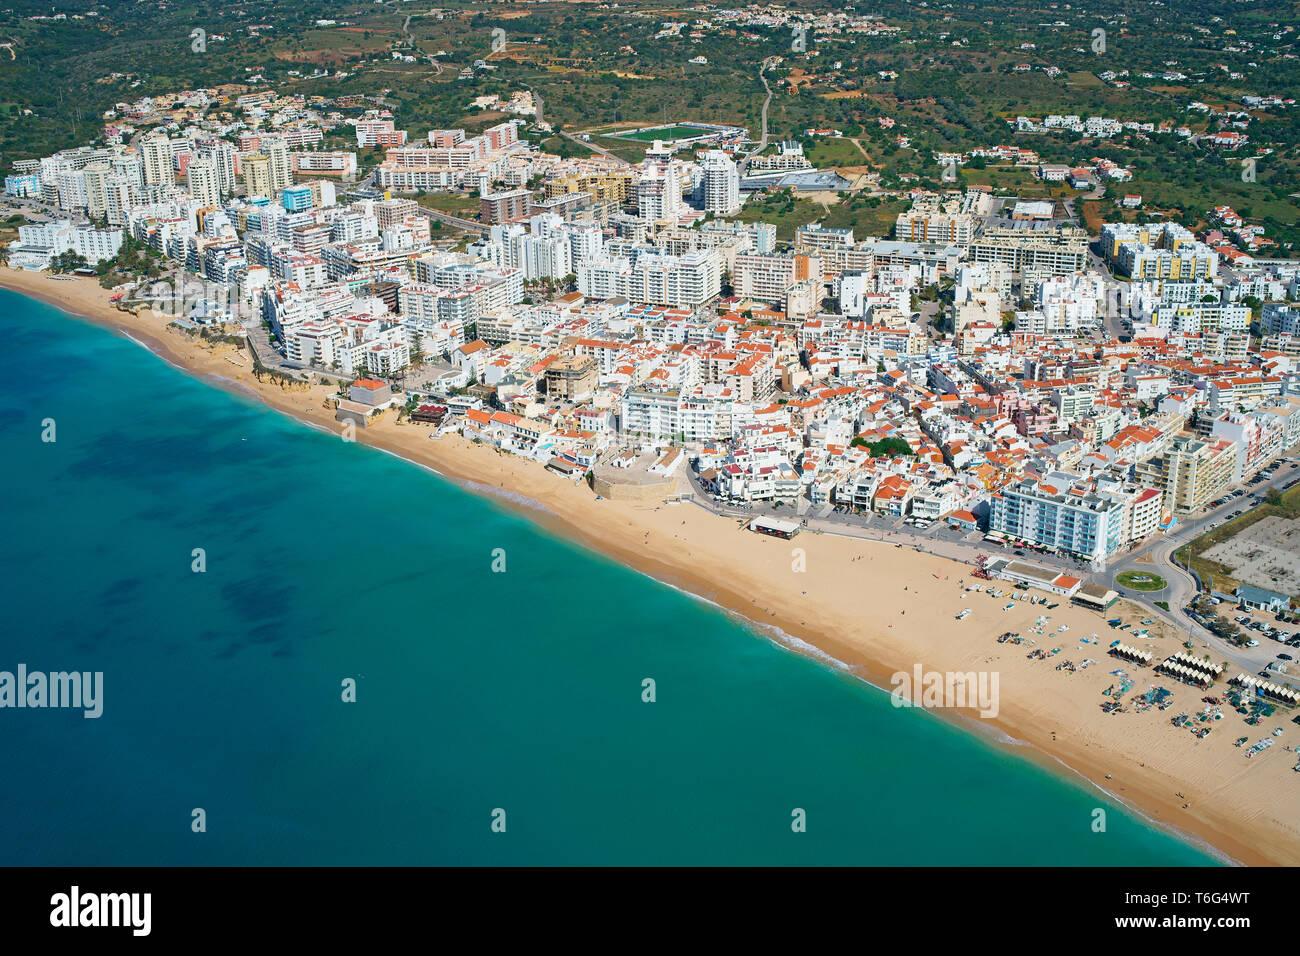 FISHING VILLAGE AND TOURIST CENTER NEAR THE MAJOR SEASIDE ROCK FORMATIONS OF THE ALGARVE (aerial view). Armação de Pêra, Portugal. - Stock Image